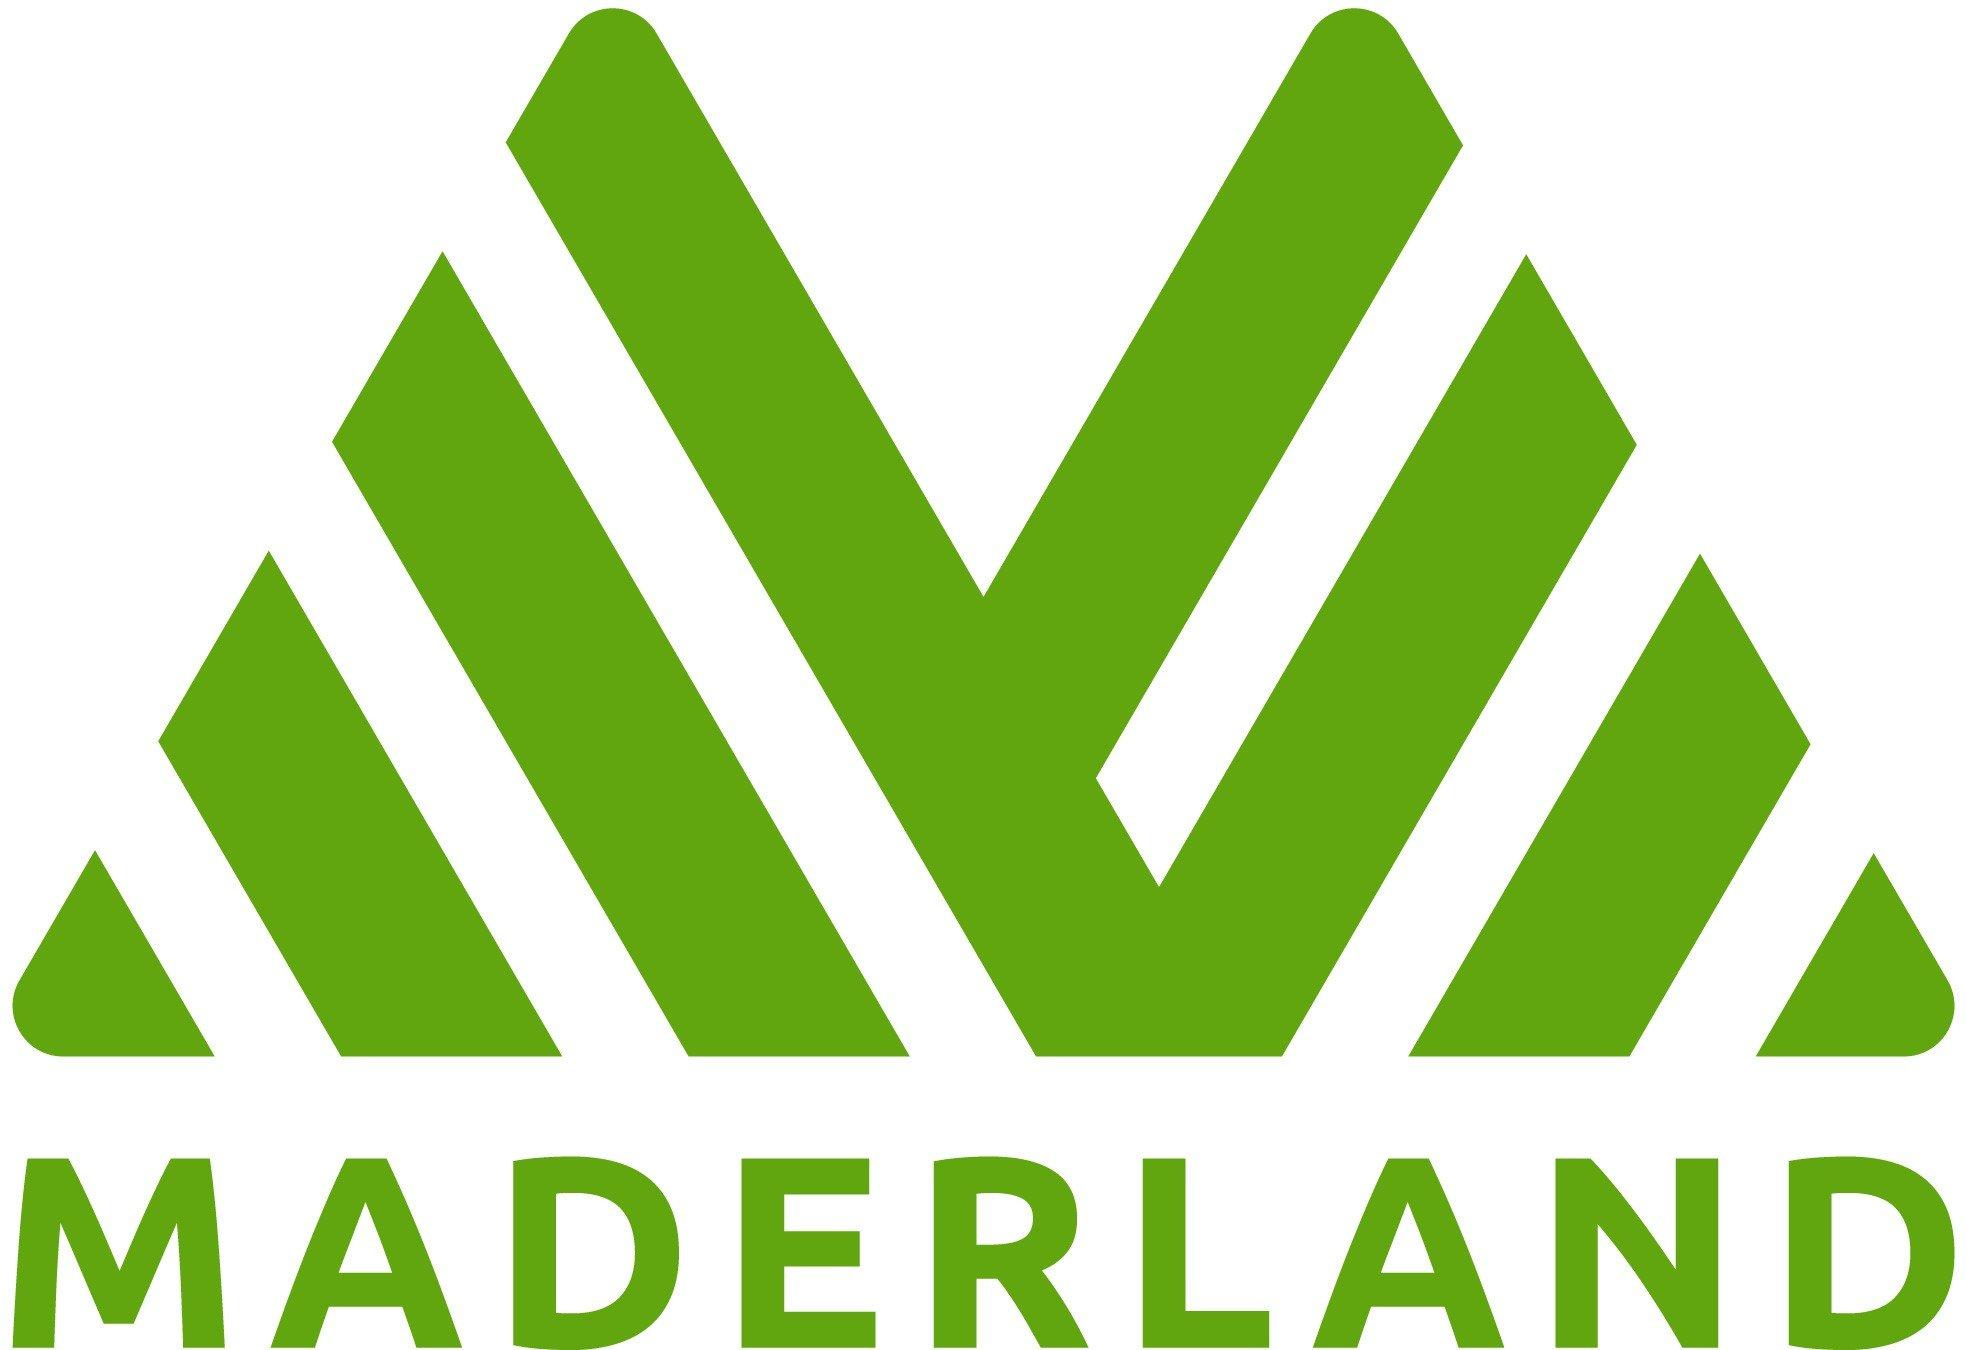 Maderland